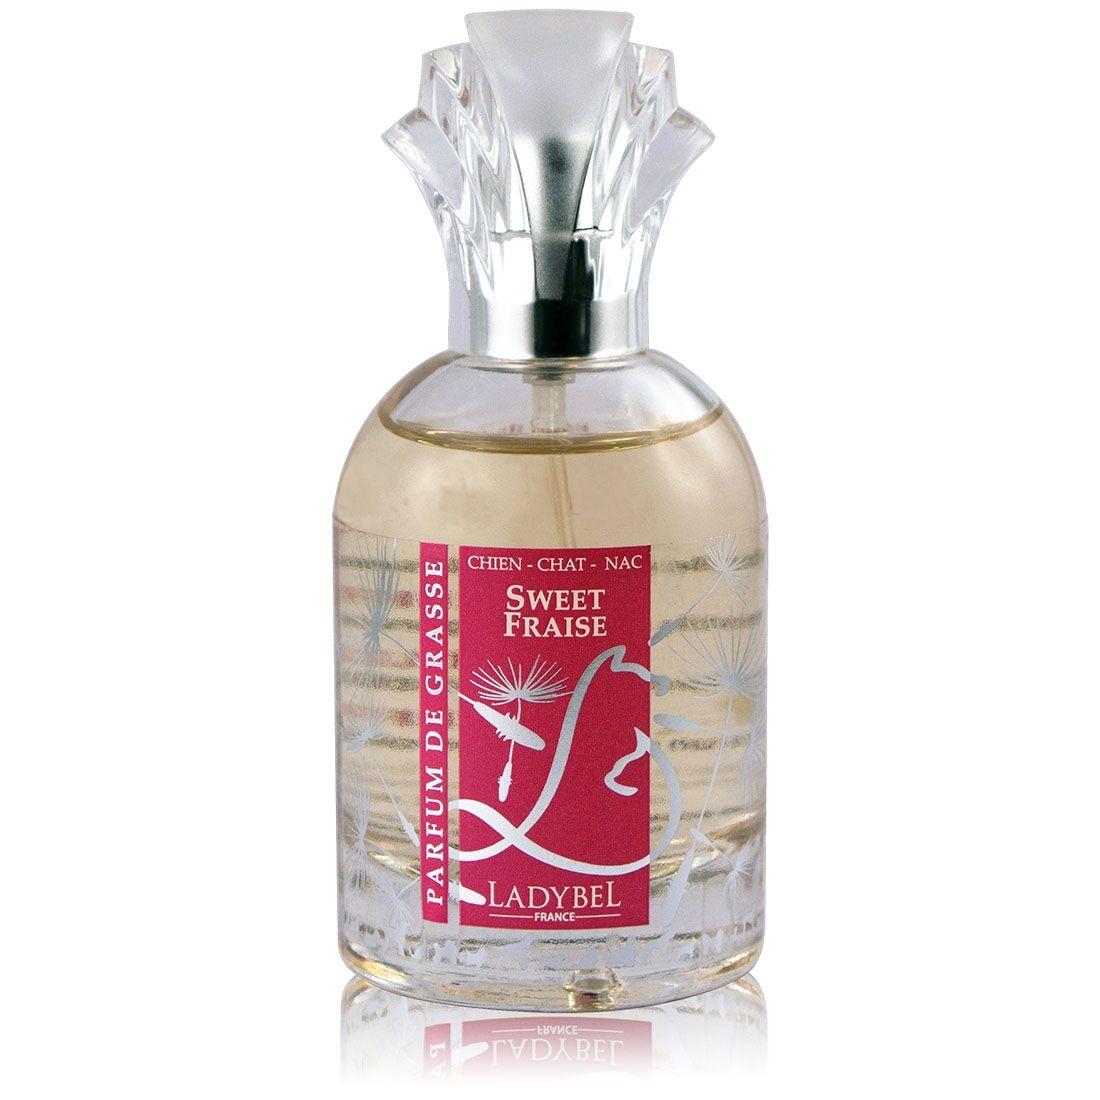 Ladybel Parfum Ladybel Sweet Odor Fraise Contenance : 50 ml